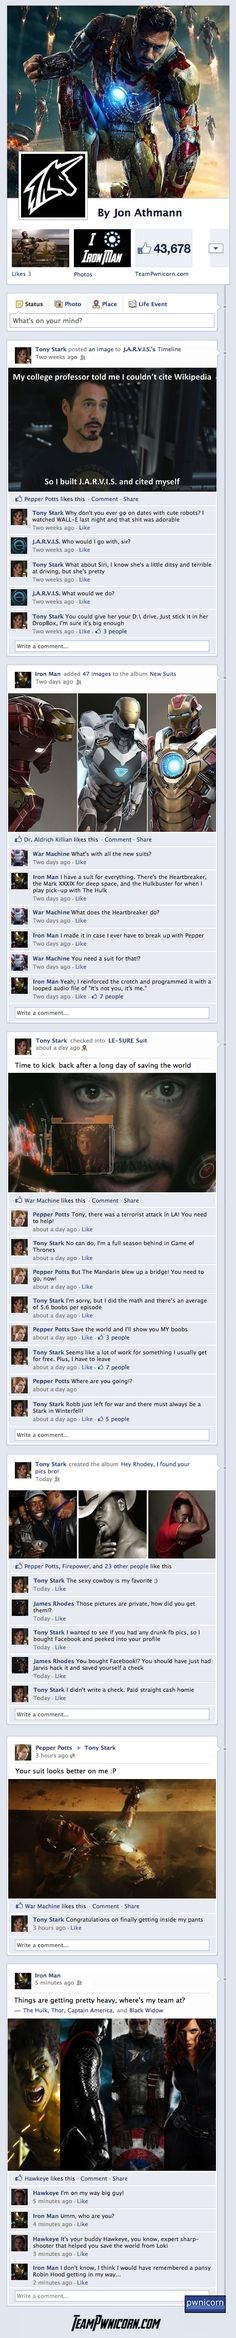 if Iron Man 3 was told through Facebook